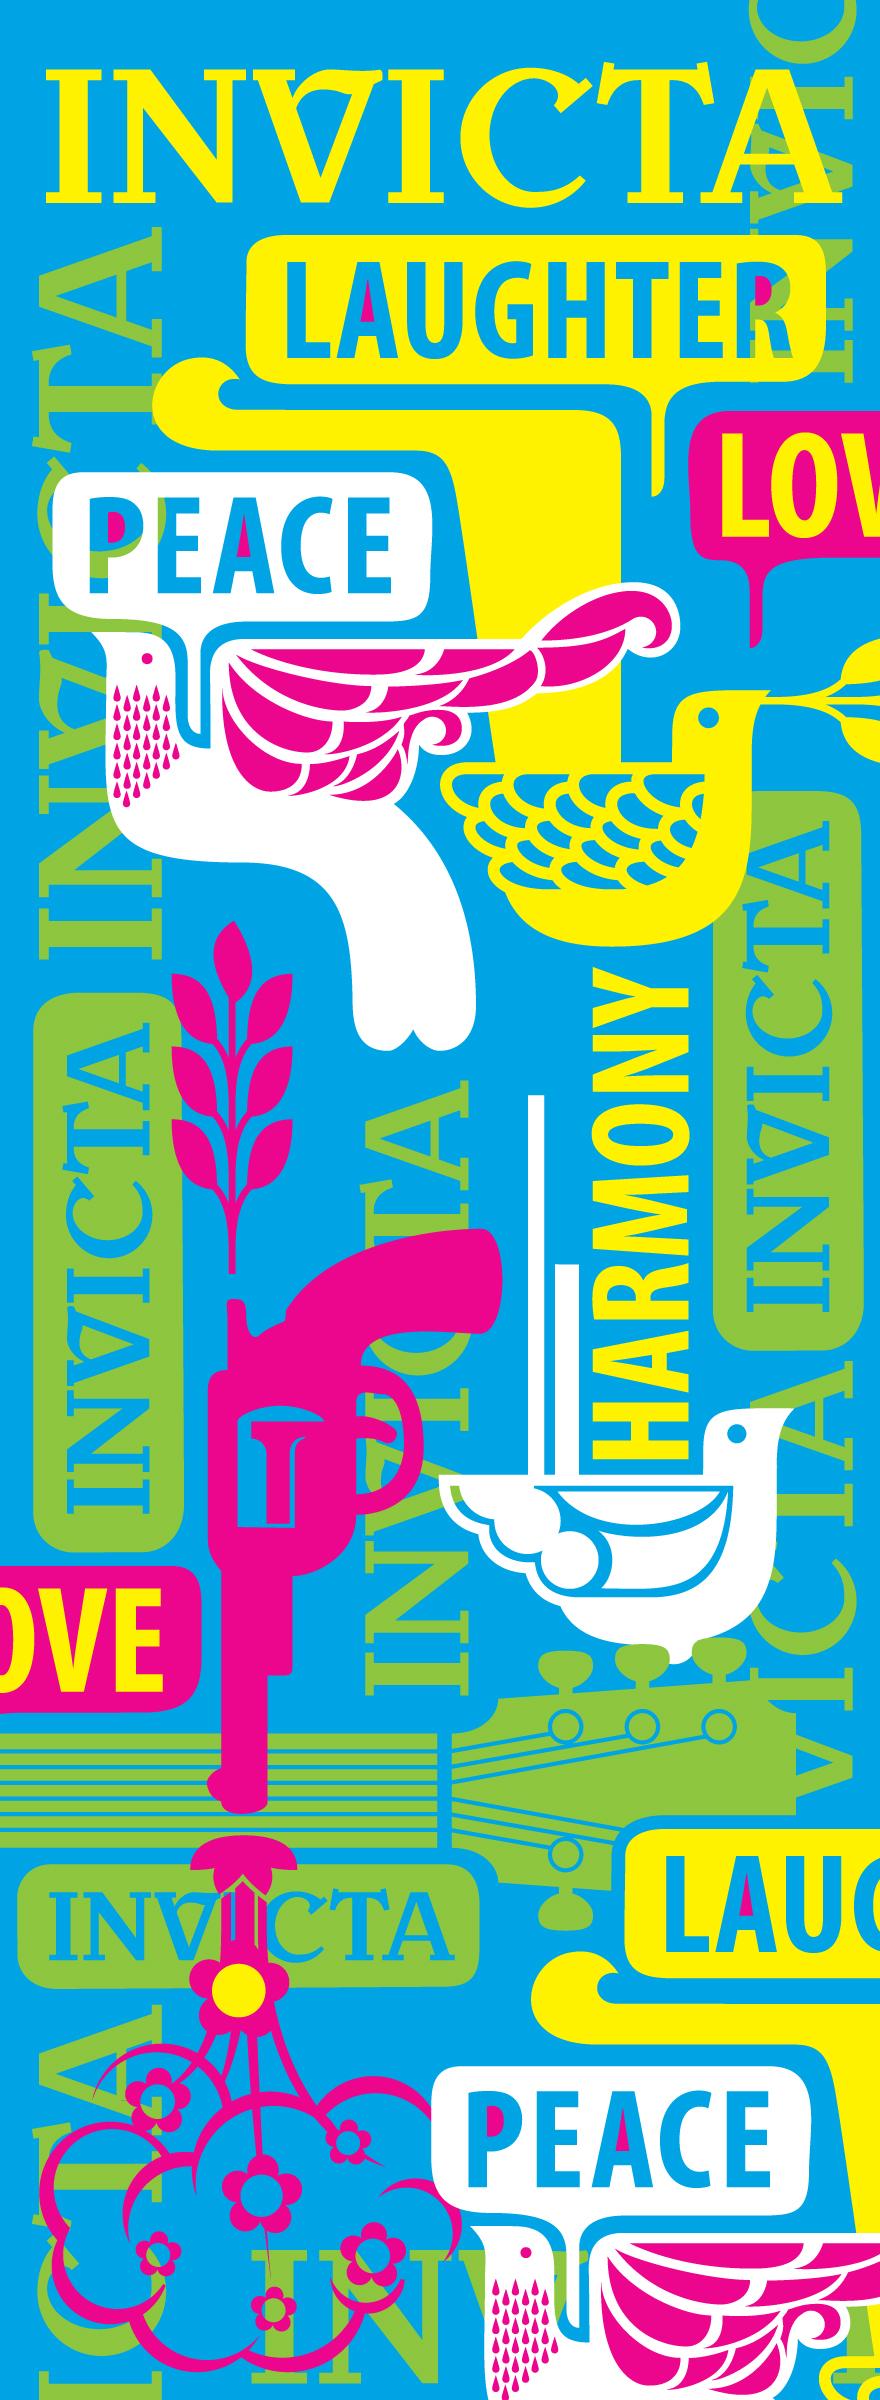 IN_Poster_SNBC_Bohemian_design_B_03.jpg